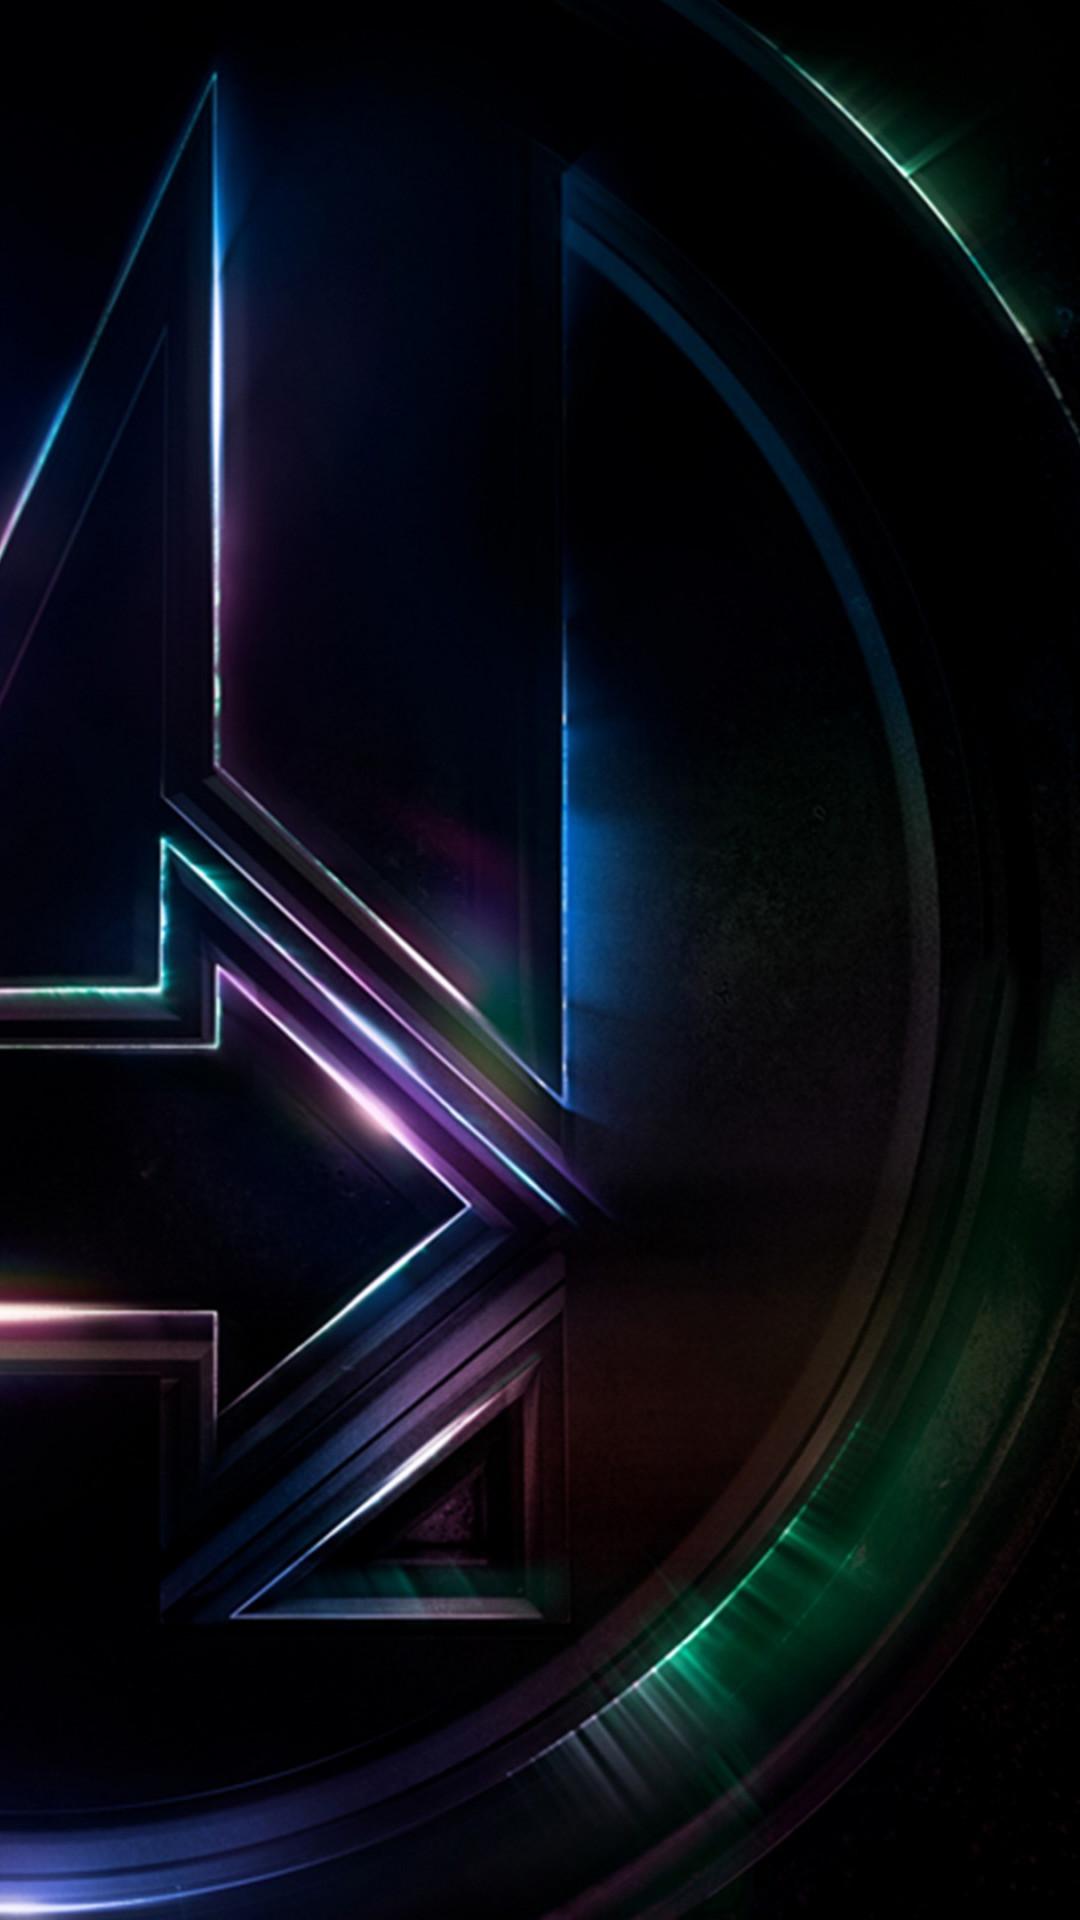 Wallpaper 4k Iphone X Download Wallpaper Logo Of Avengers Infinity War 1080x1920